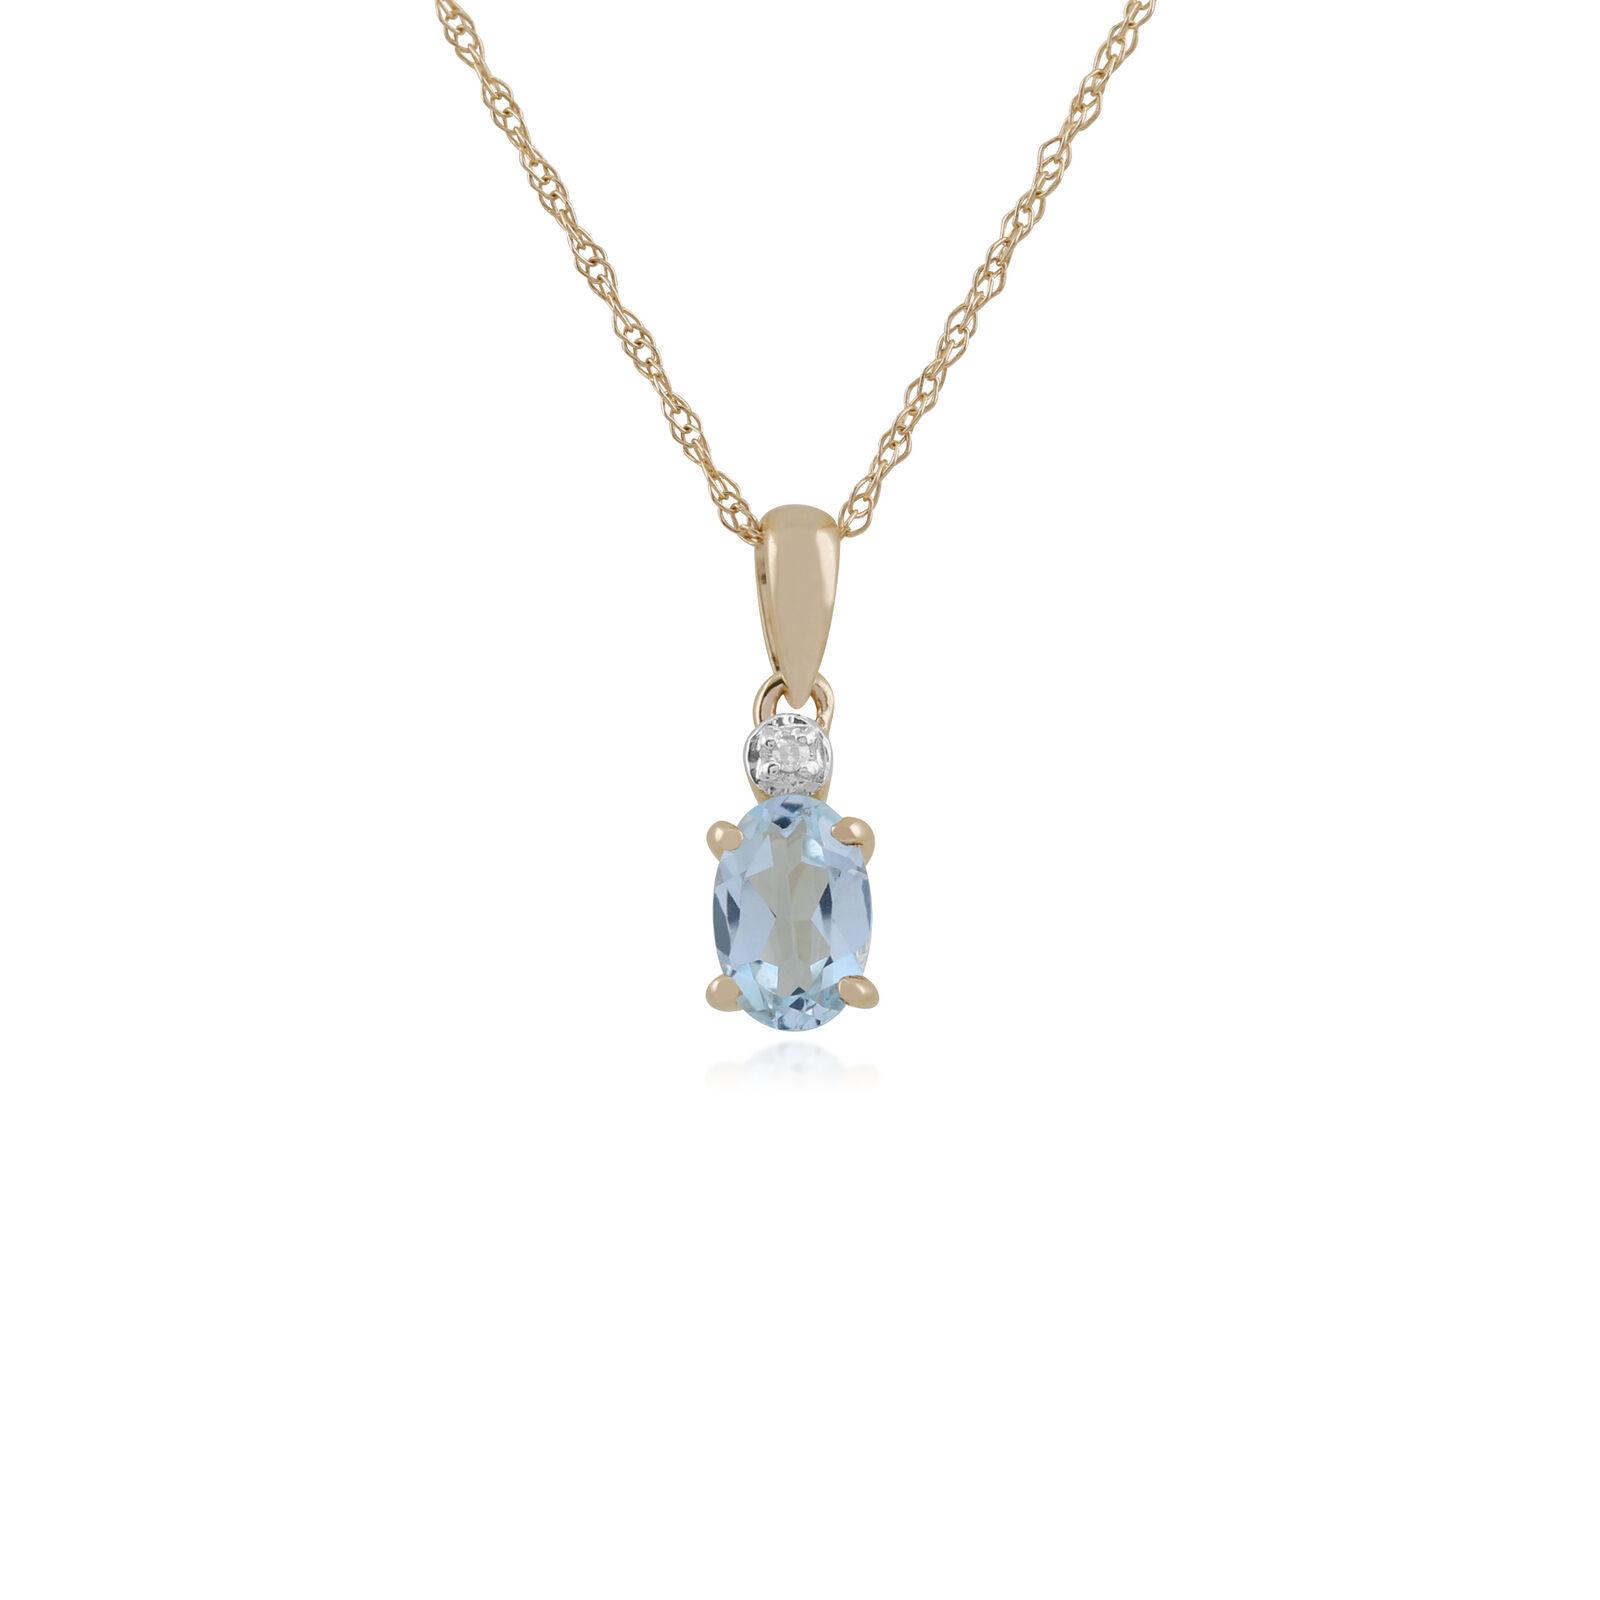 Gemondo 9ct or yellow 0,39 CT Aigue-Marine & Diamant Pendentif Ovale sur 45cm